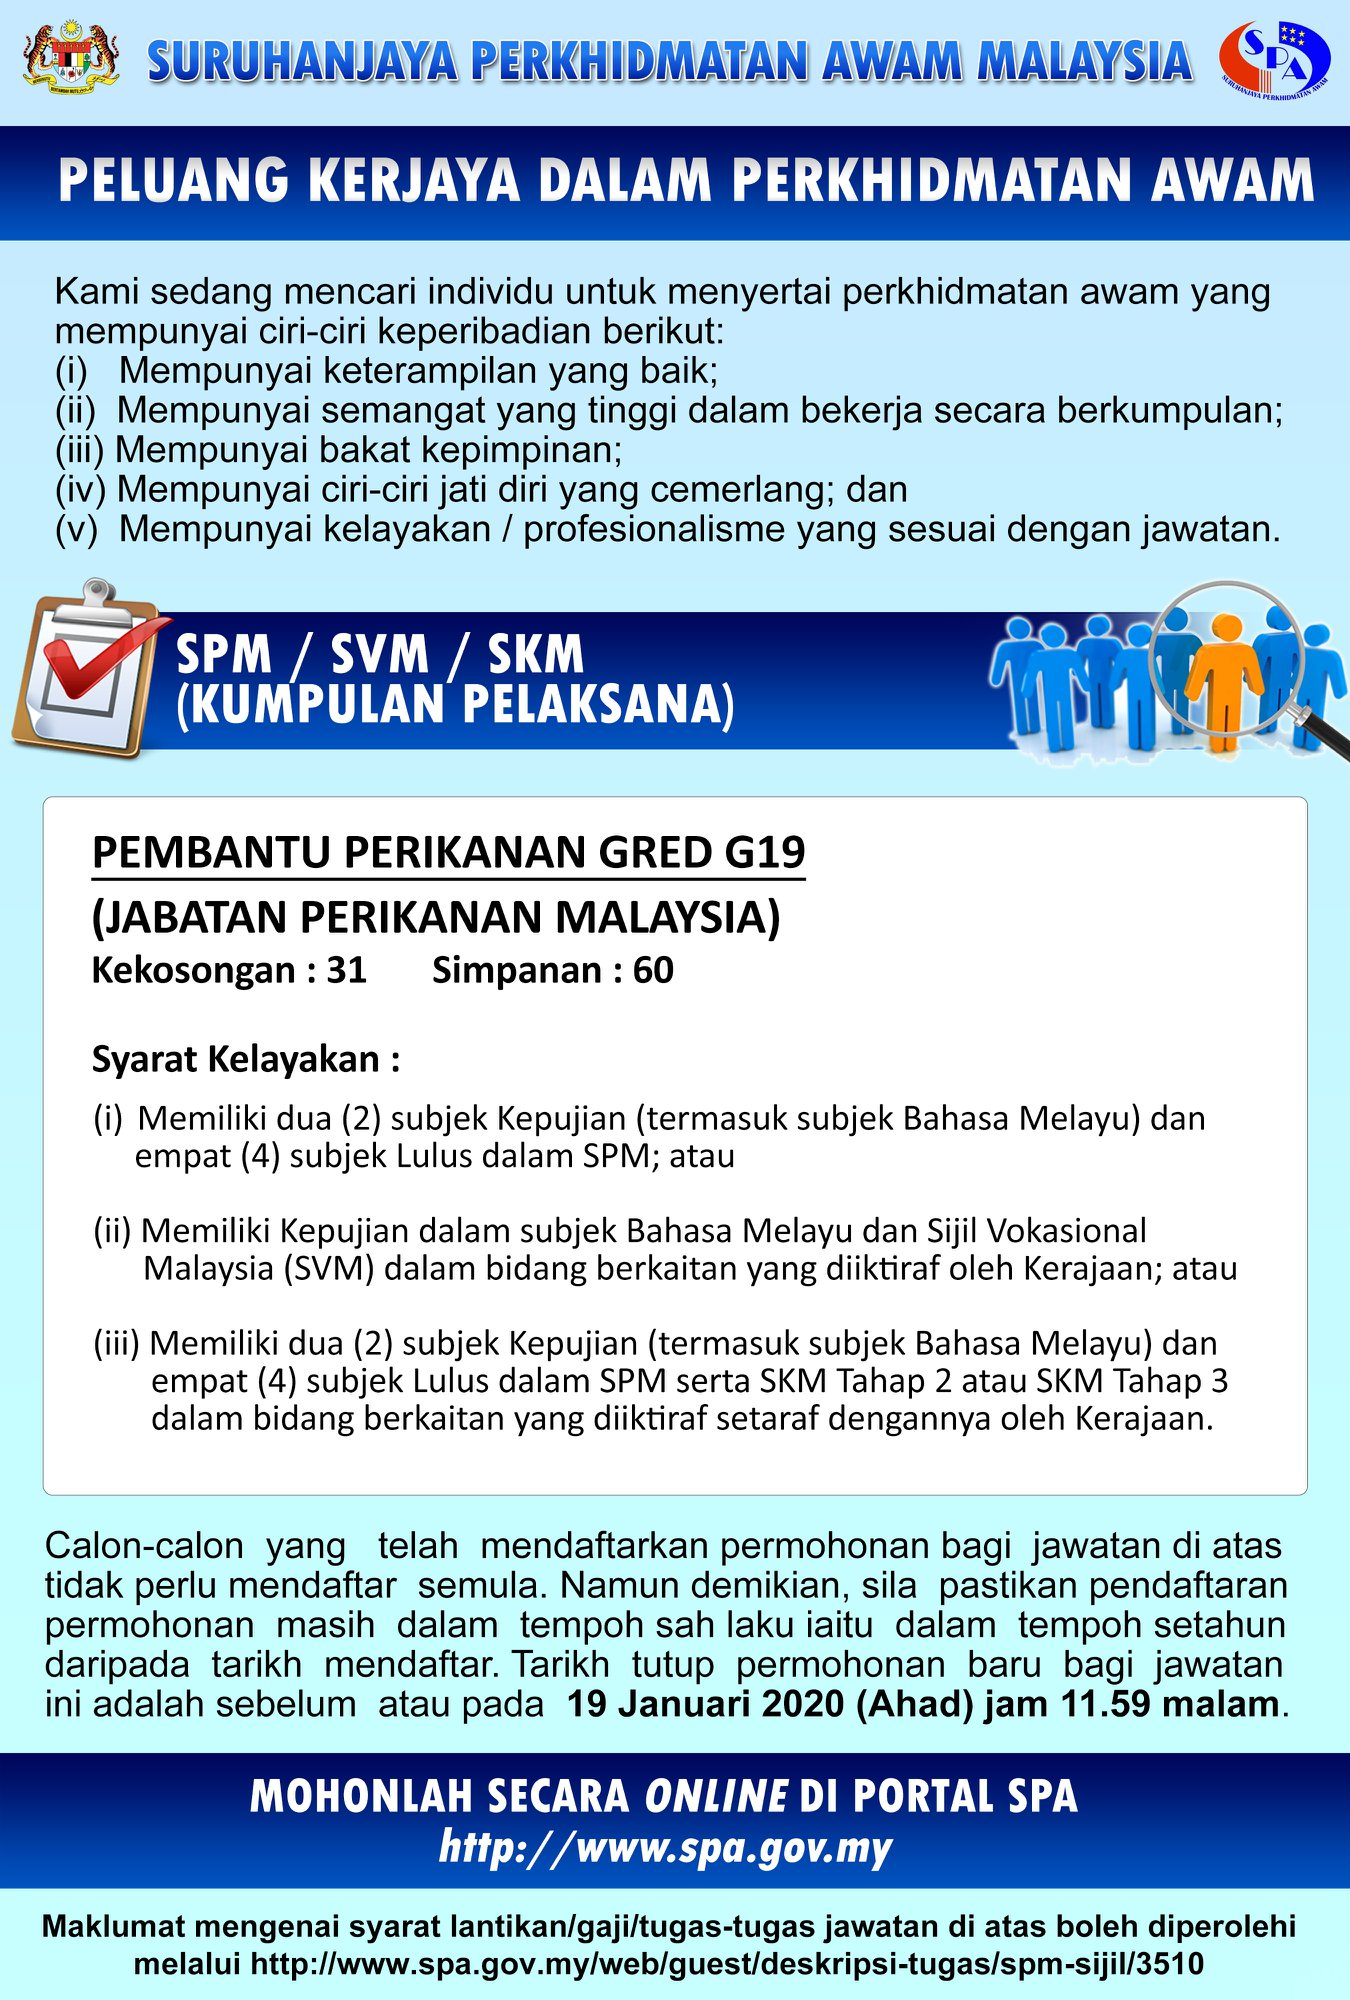 Jawatan Kosong Jabatan Perikanan Malaysia (1)